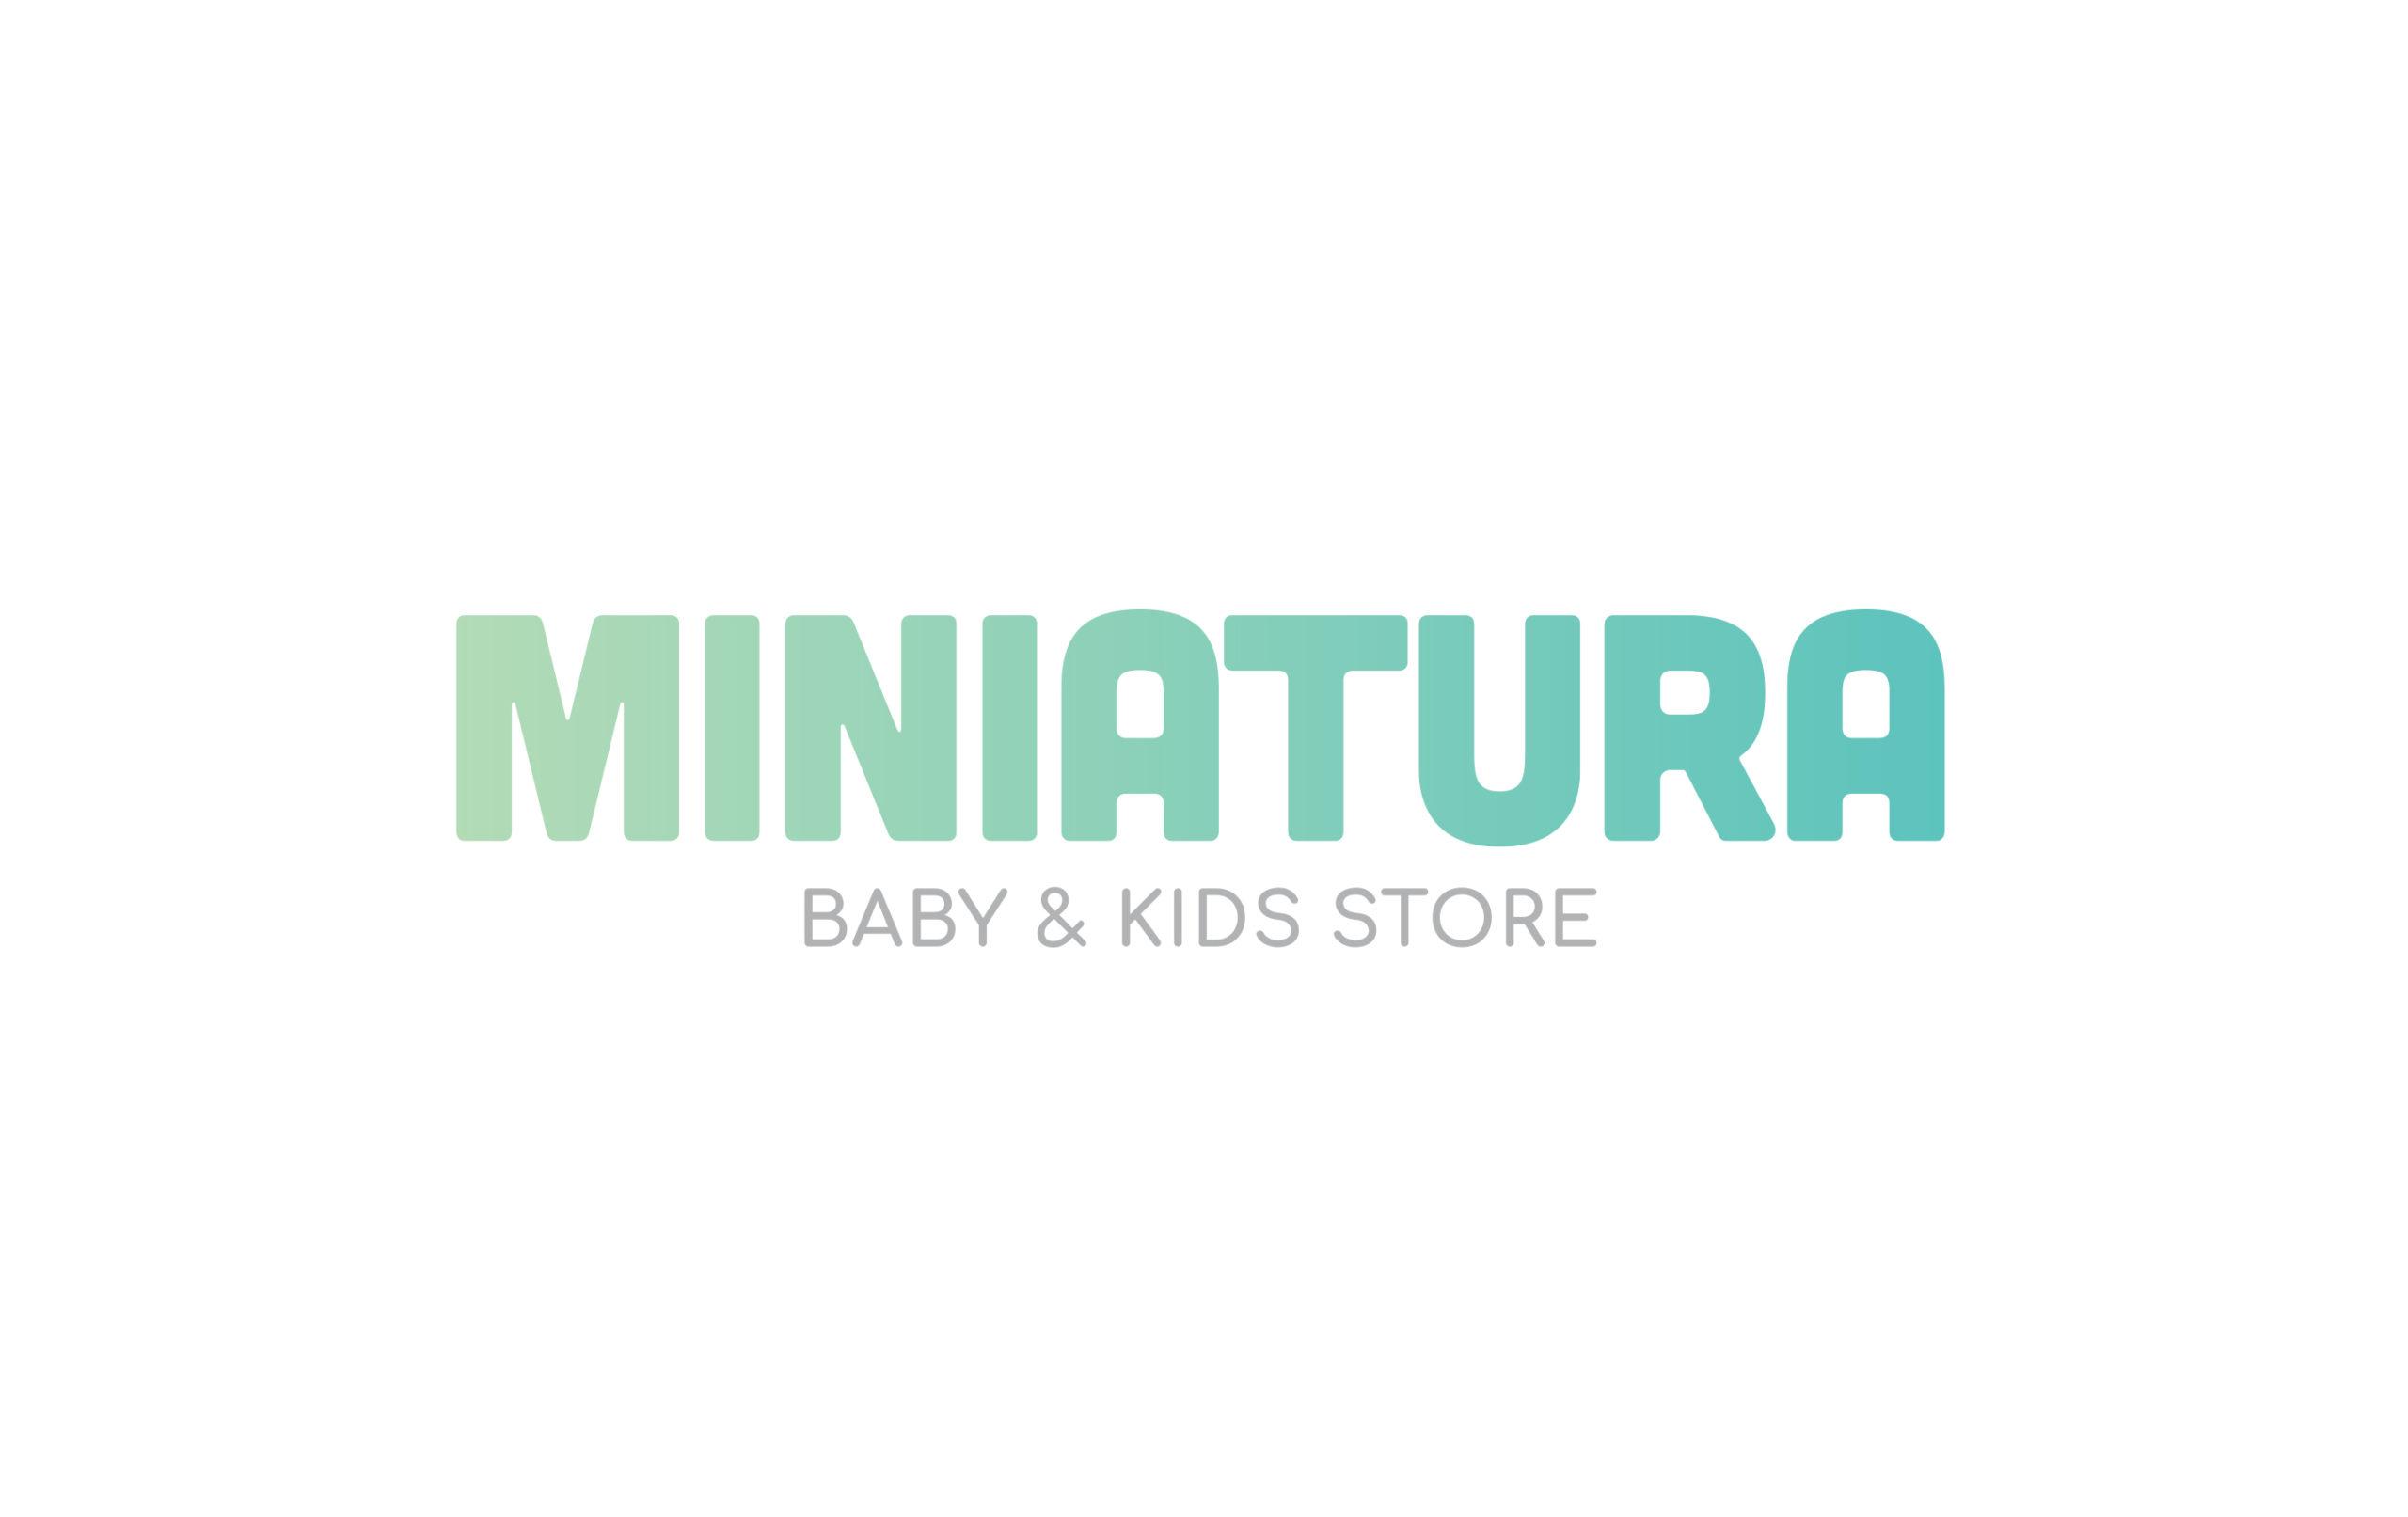 port_miniatura_2